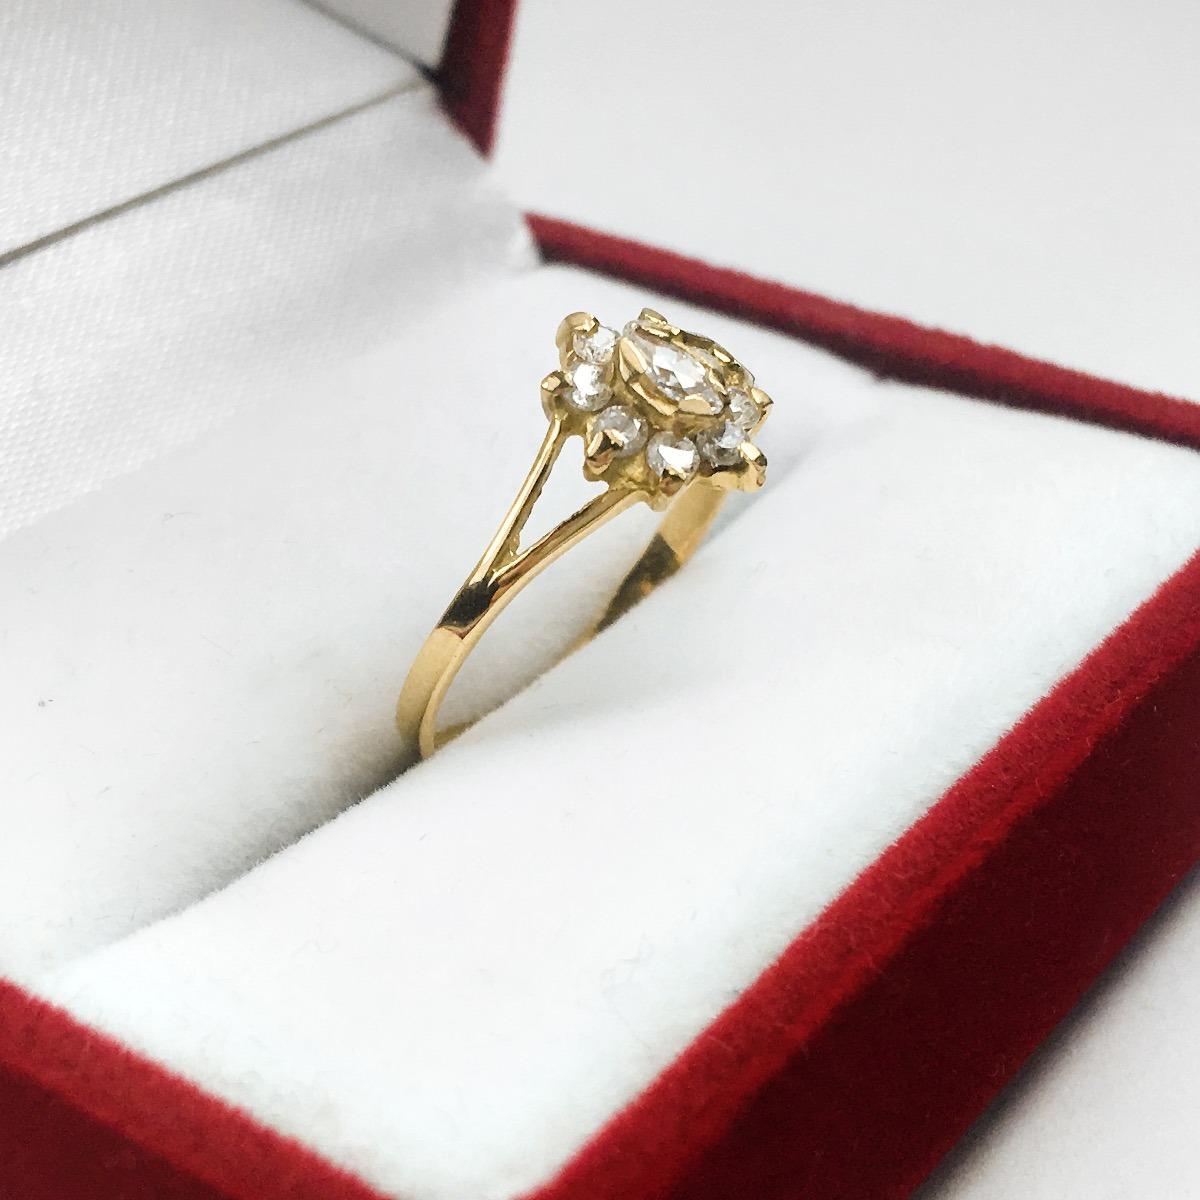 52092fbaac48 anillos oro 18k compromiso roseta con cubics mujer. Cargando zoom.